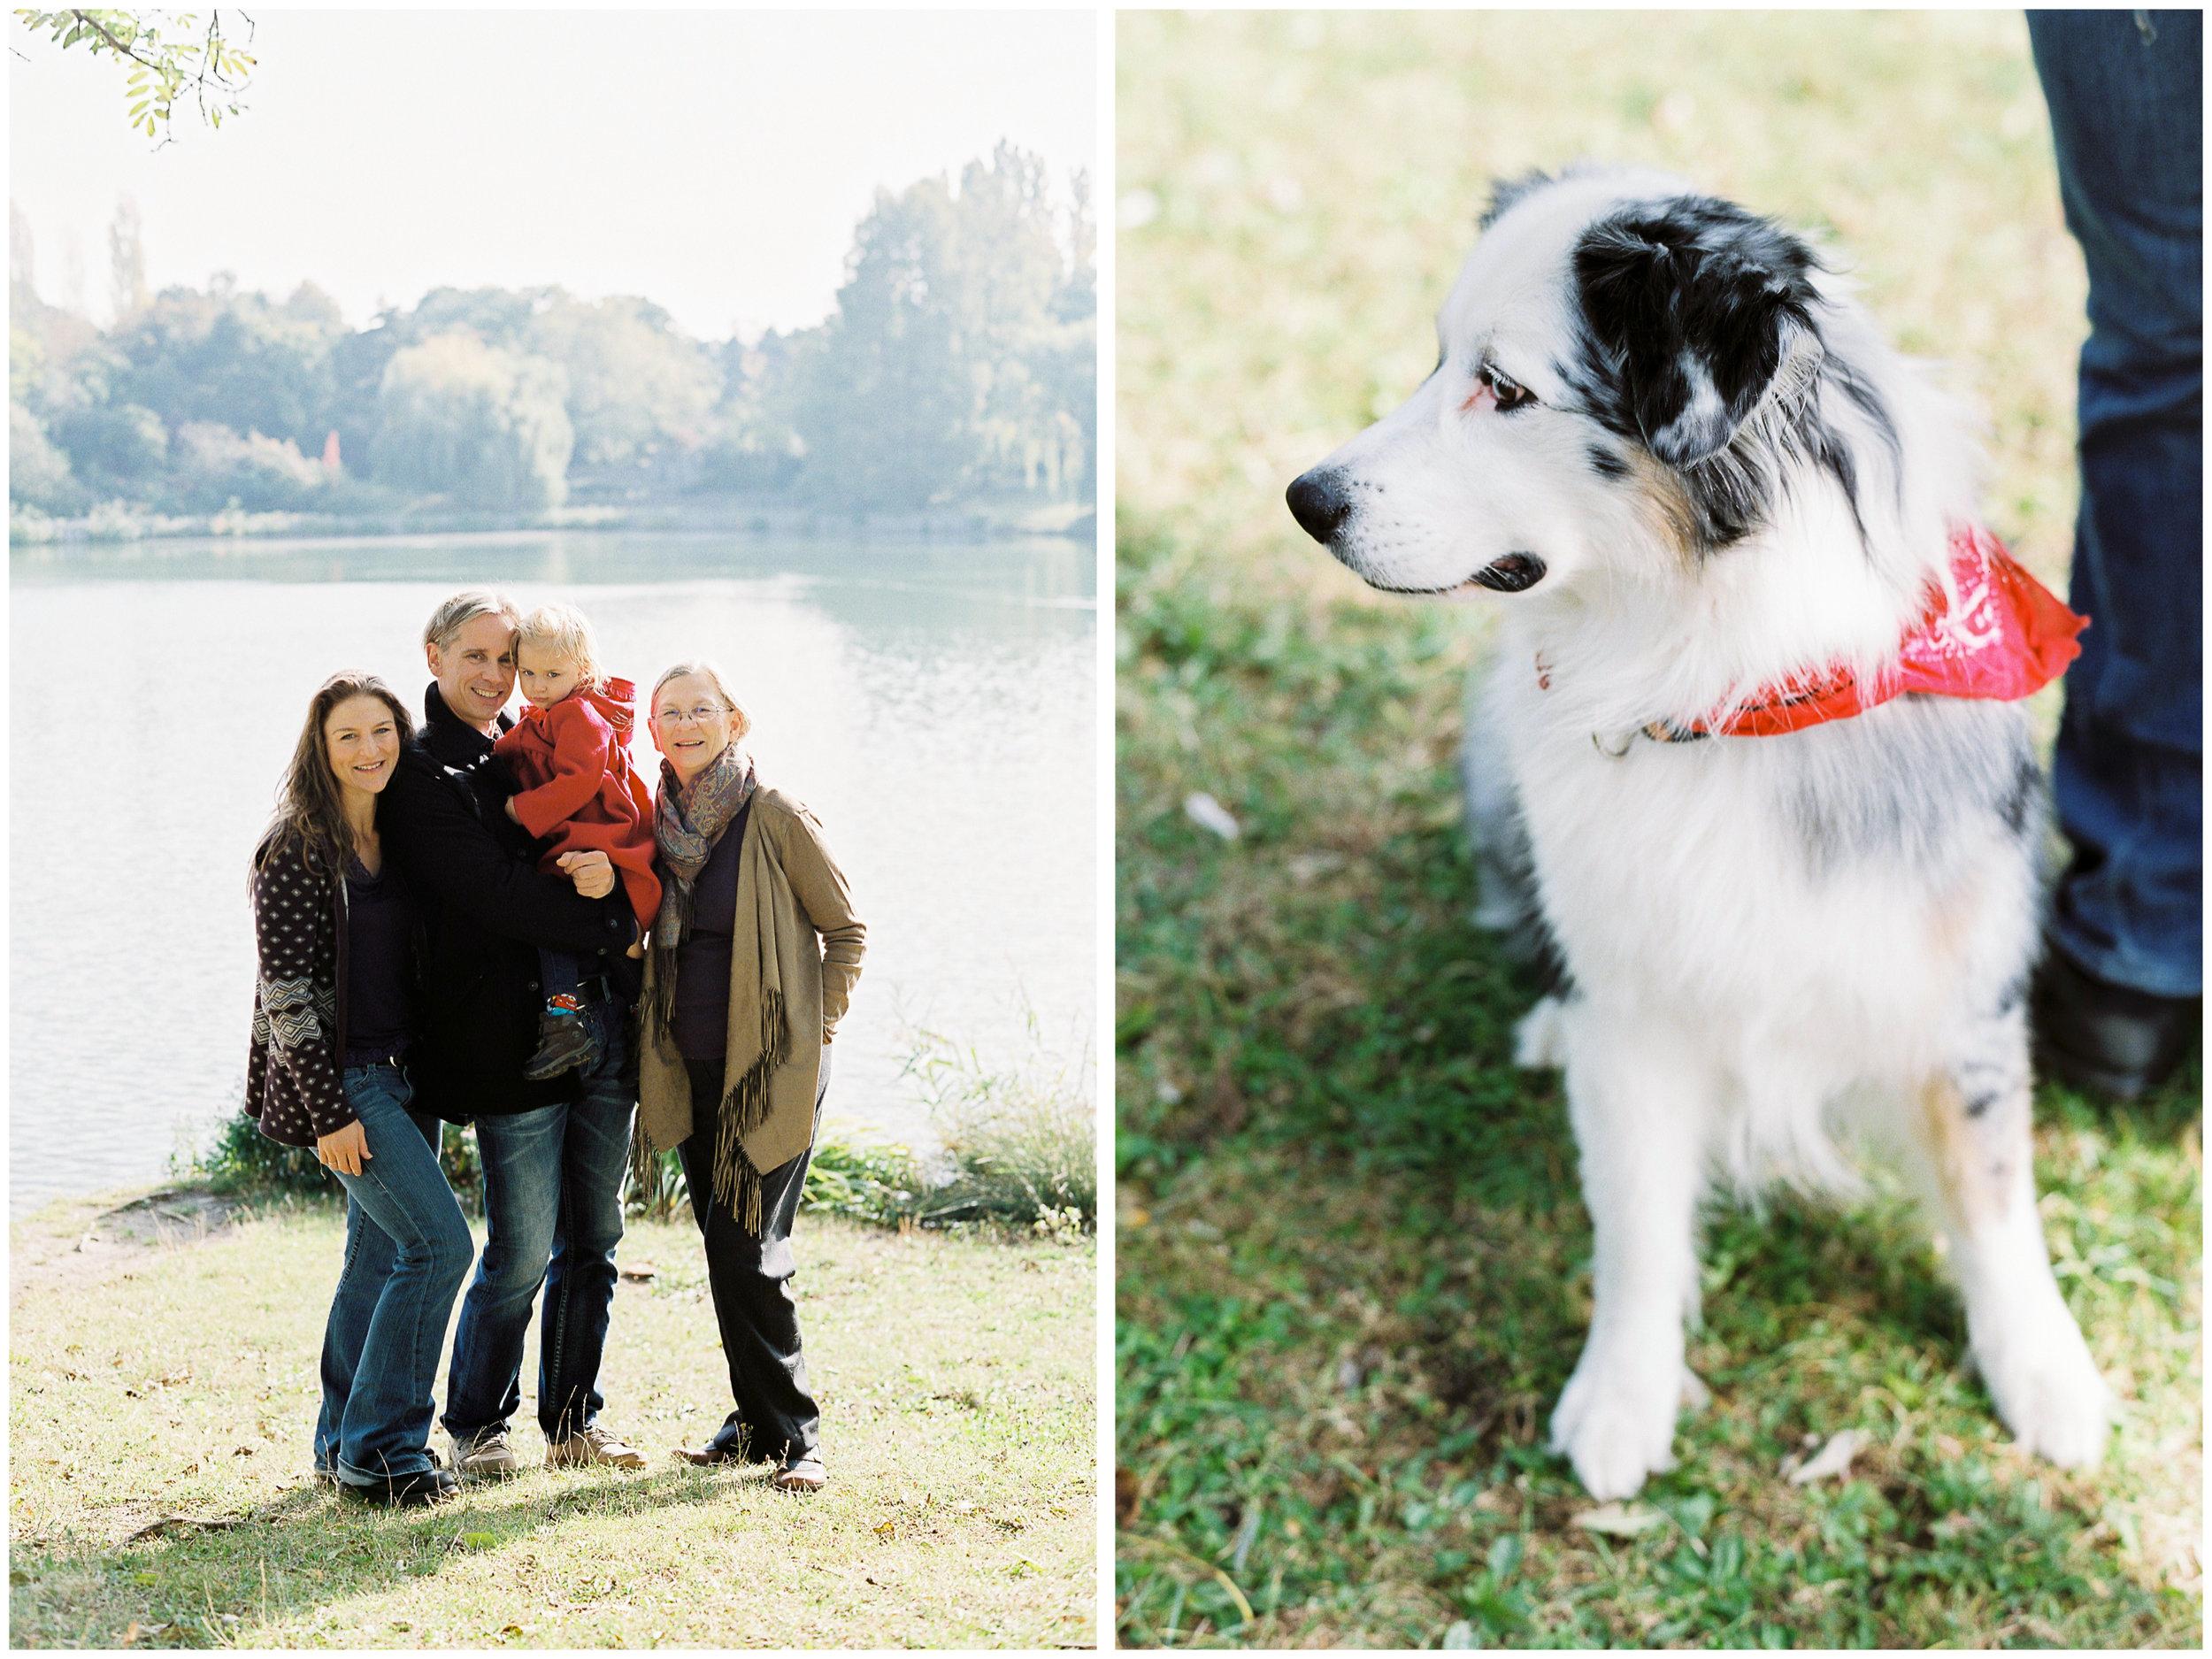 Family Fall Portraits | Kurpark Oberlaa, Vienna | Michelle Mock Photography | Vienna Portrait Photographer | Vienna Film Photographer | Contax 645 | Fuji400